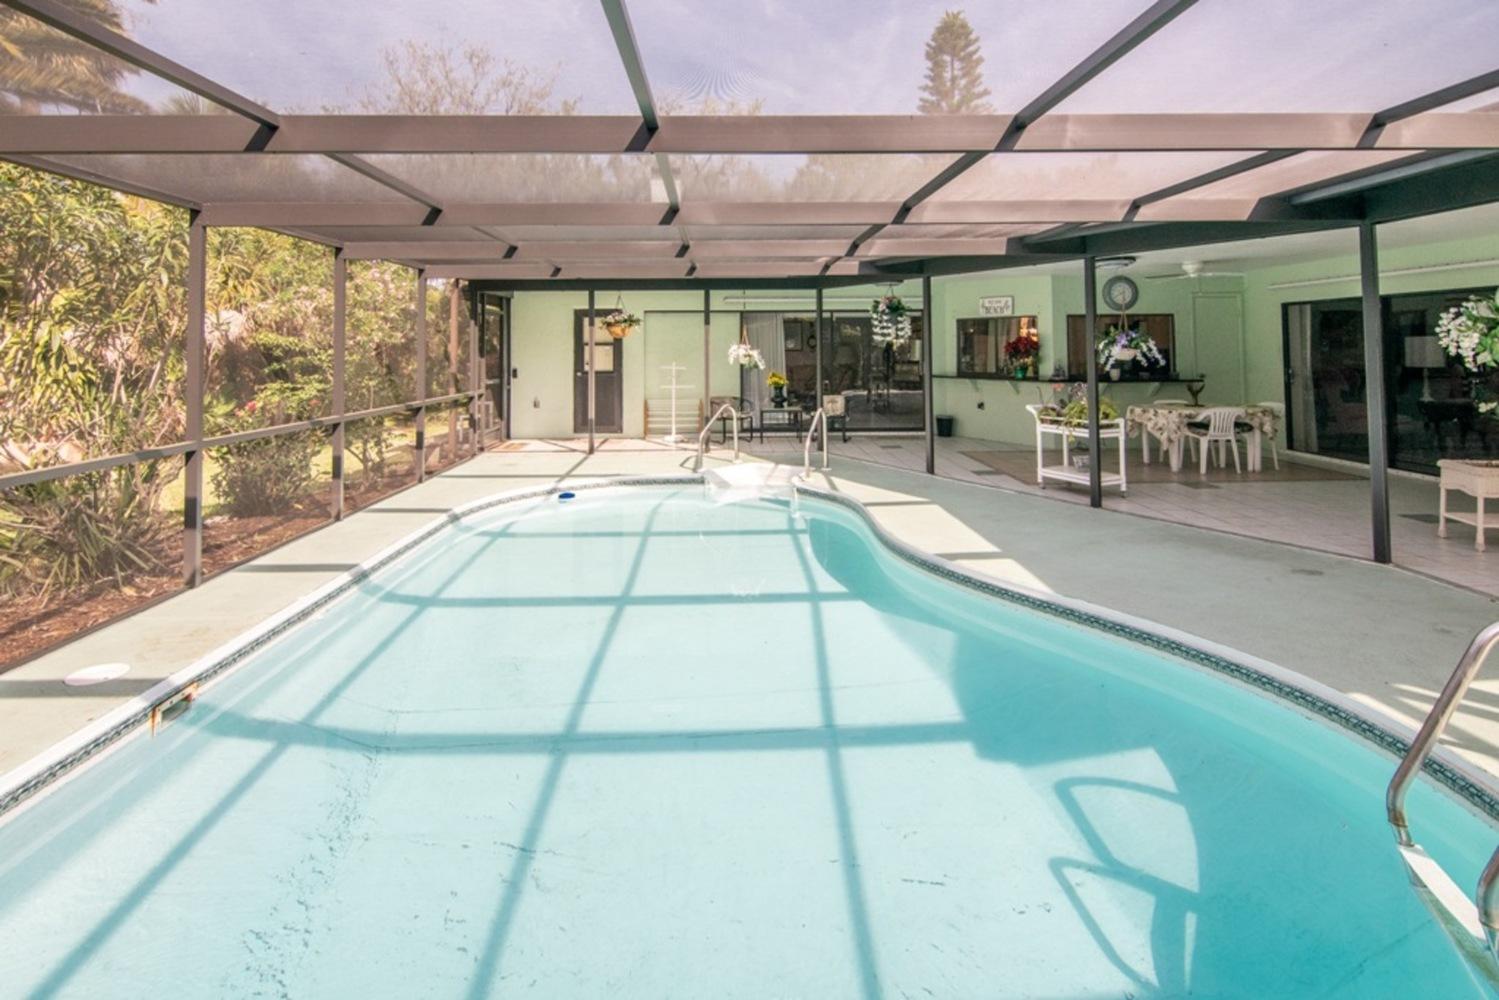 50 pool